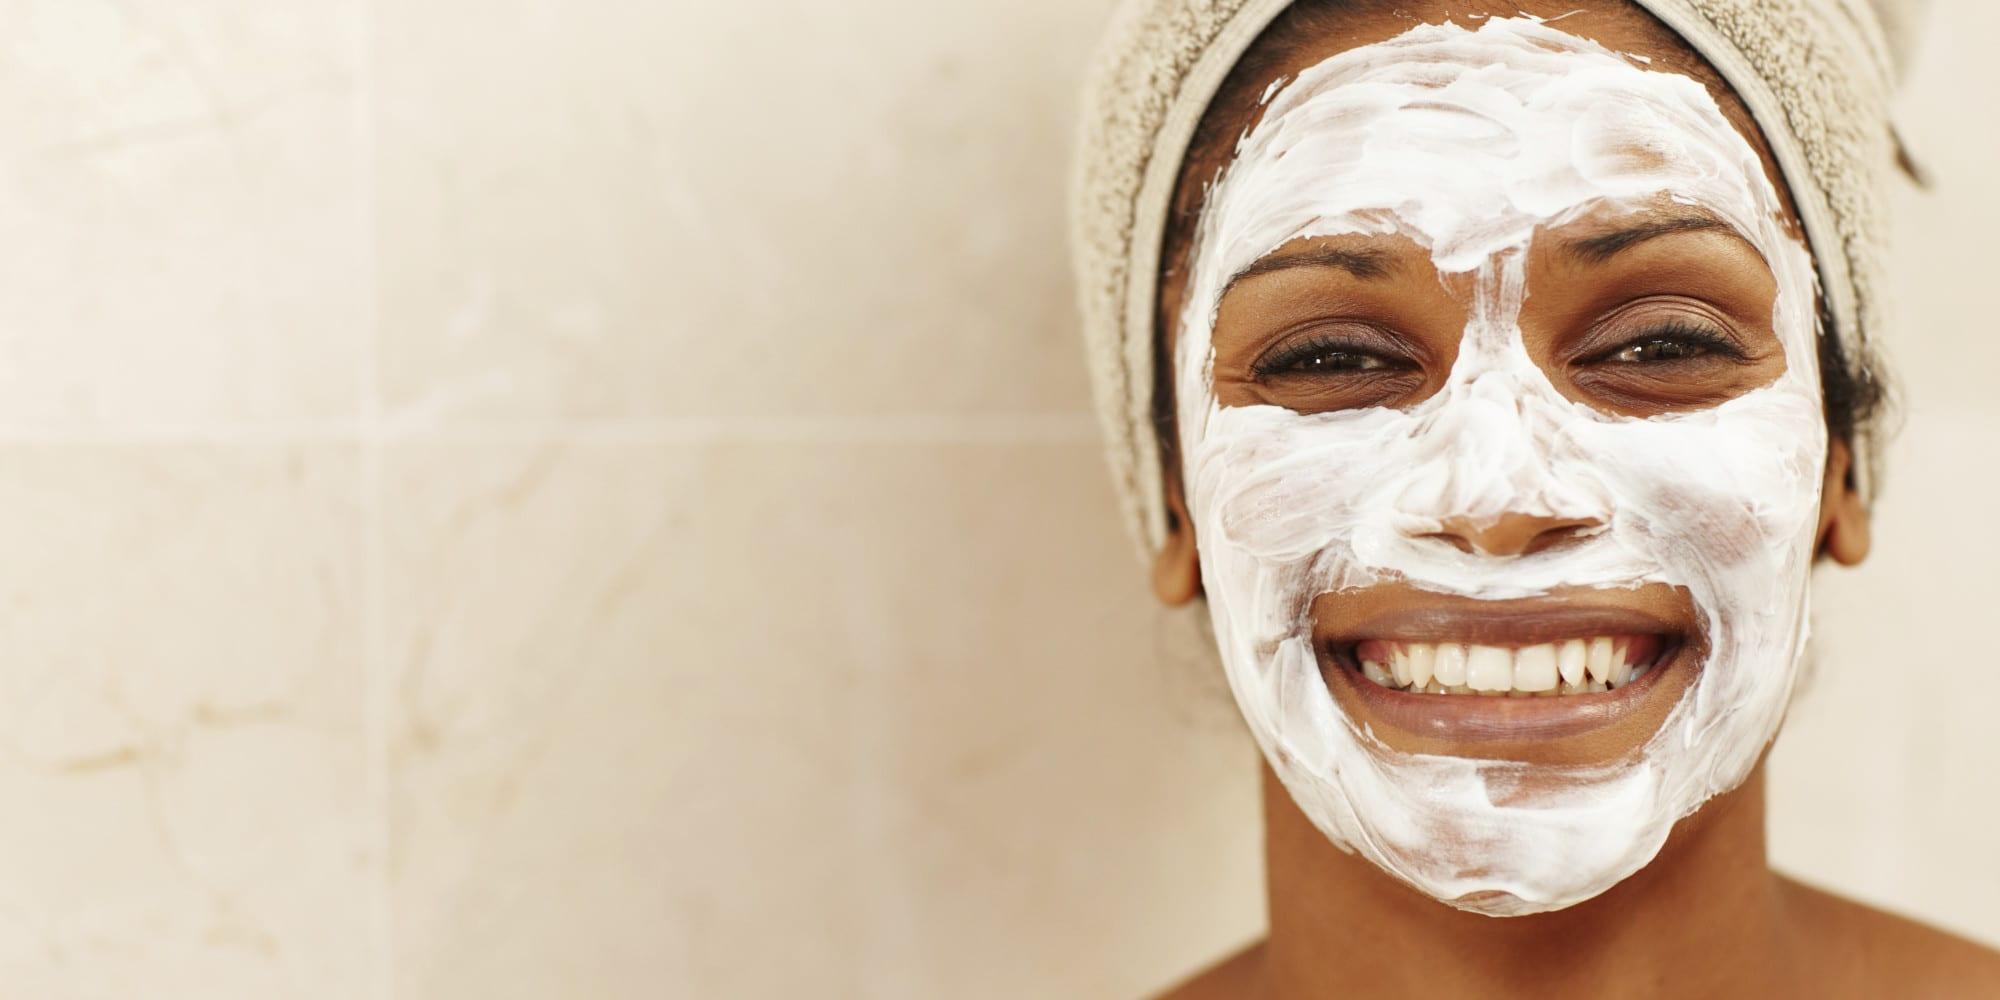 Taking good care of my skin